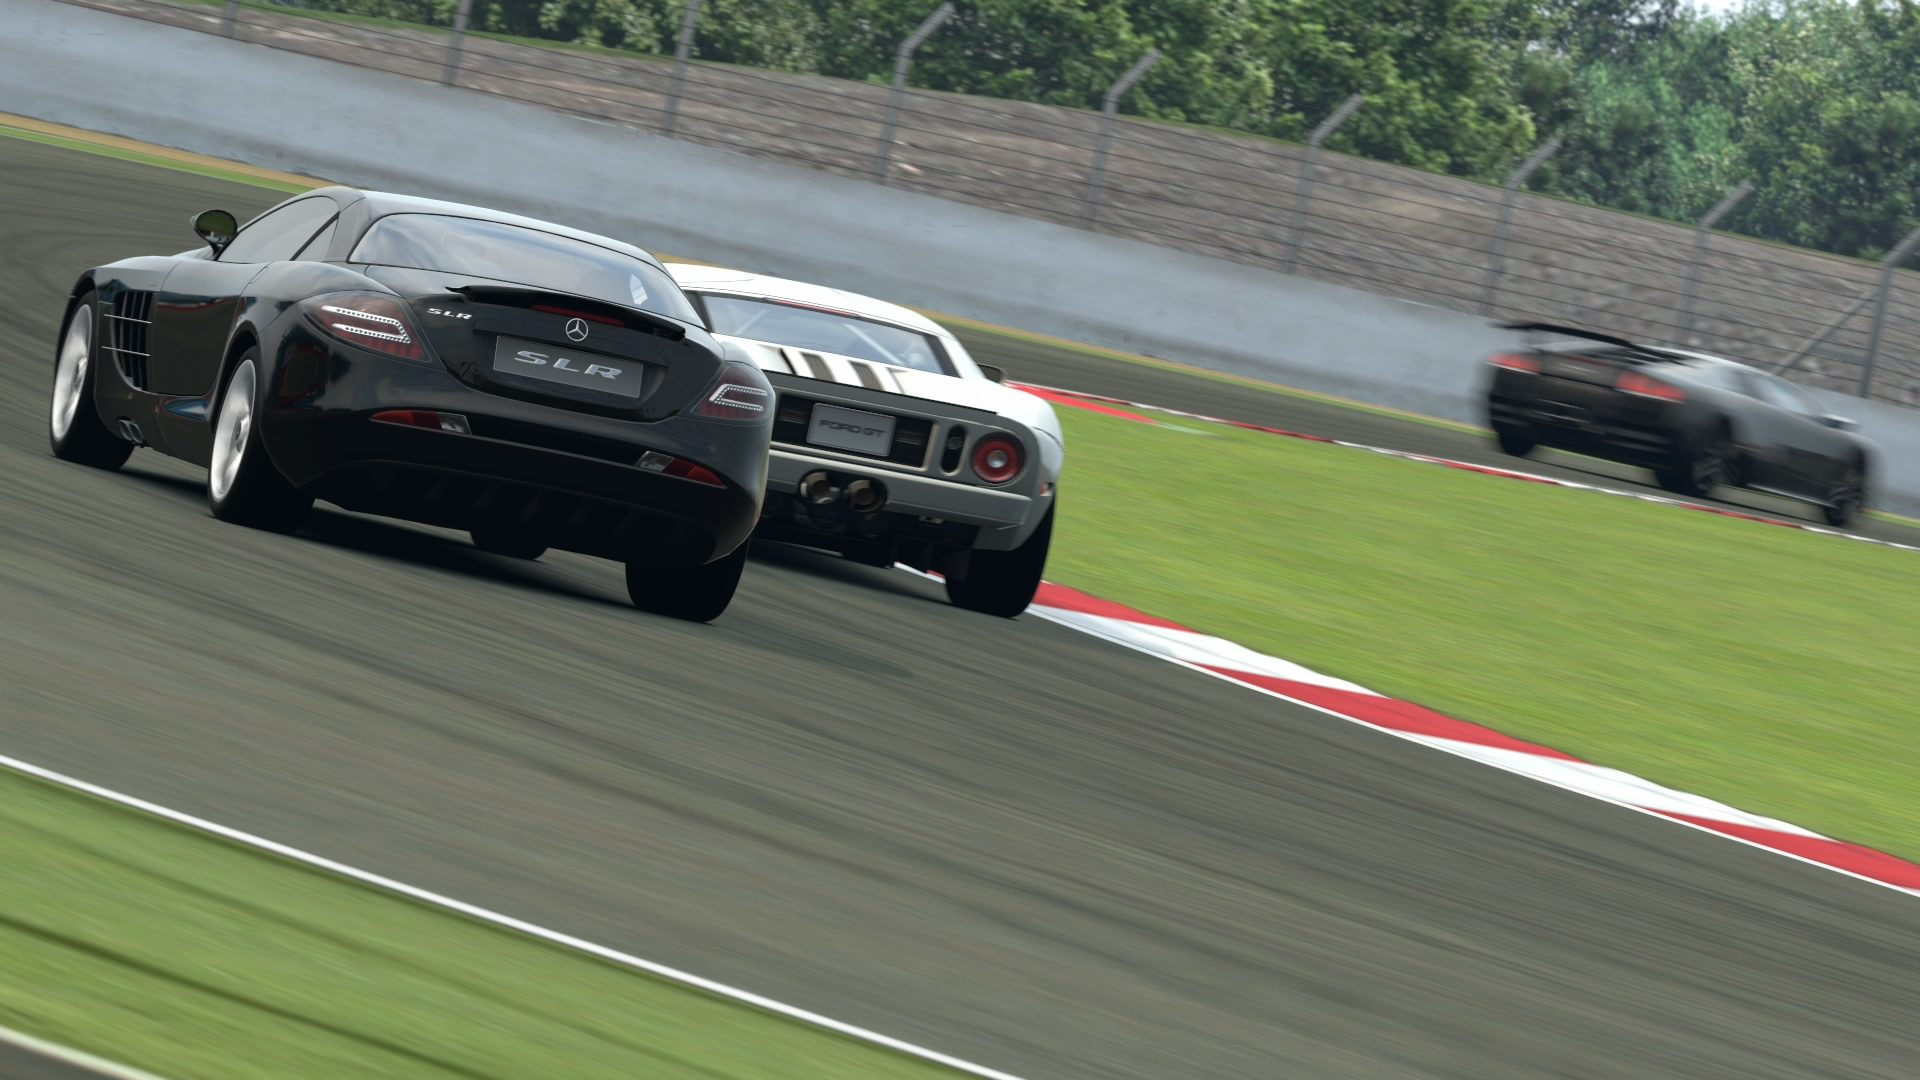 Silverstone International Circuit_6.jpg